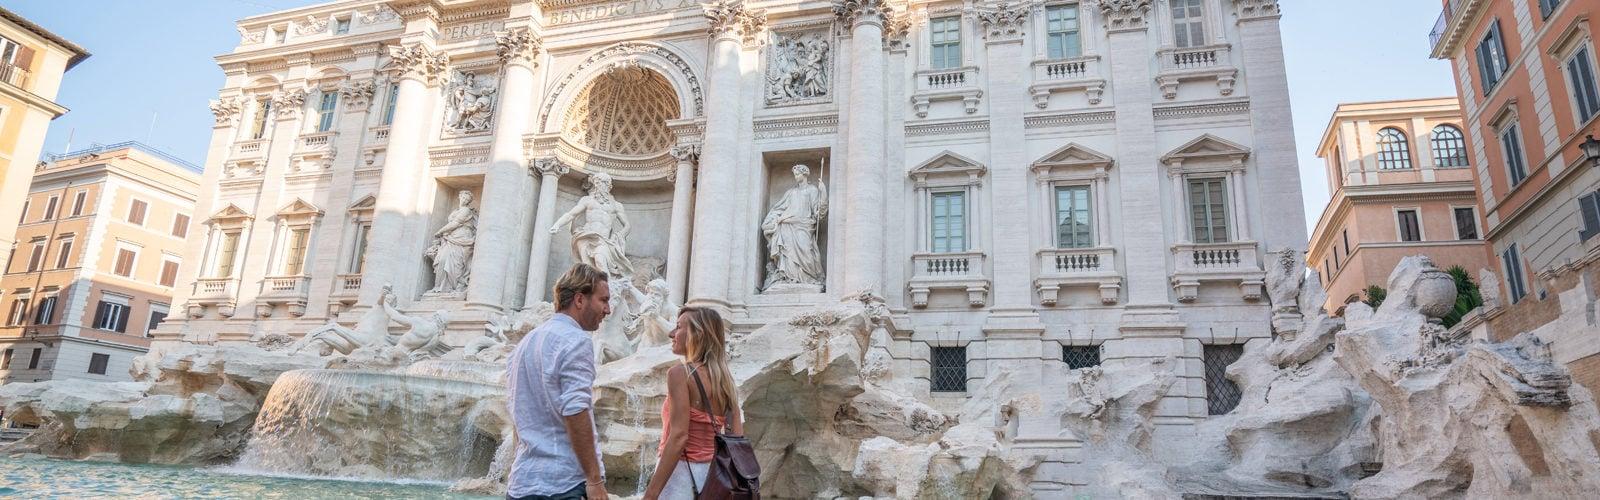 A Luxury Italian Honeymoon Jacada Travel